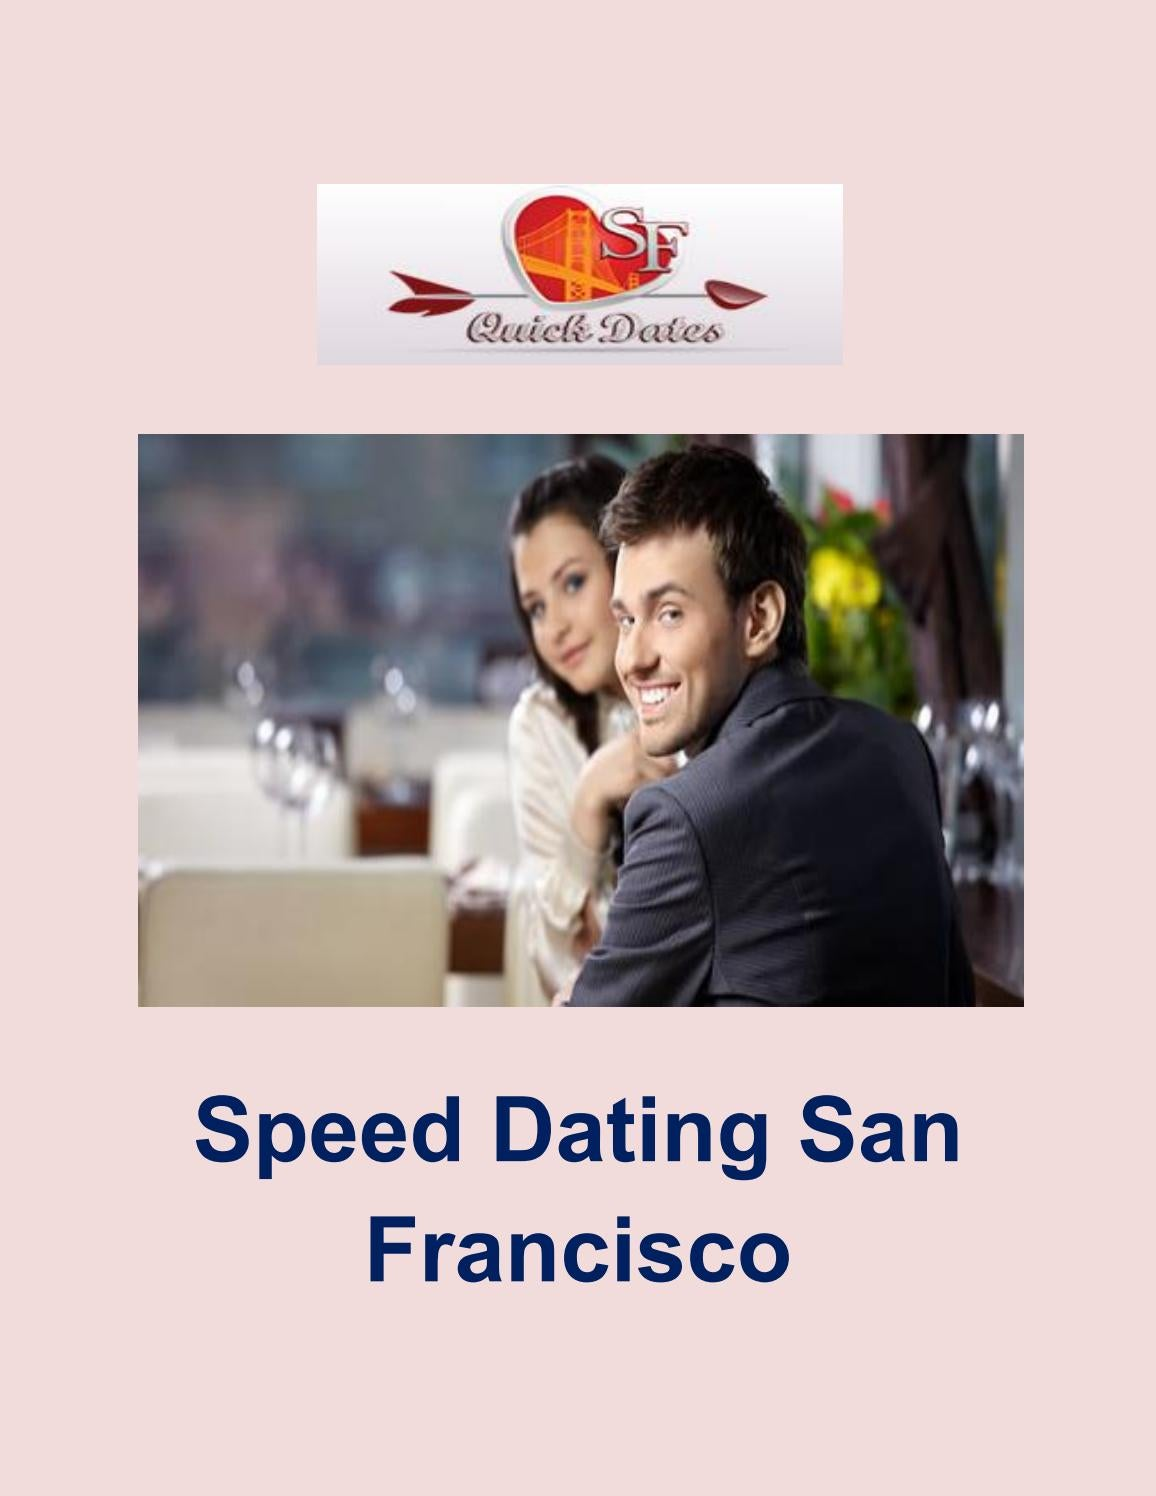 Sf speed dating događaji